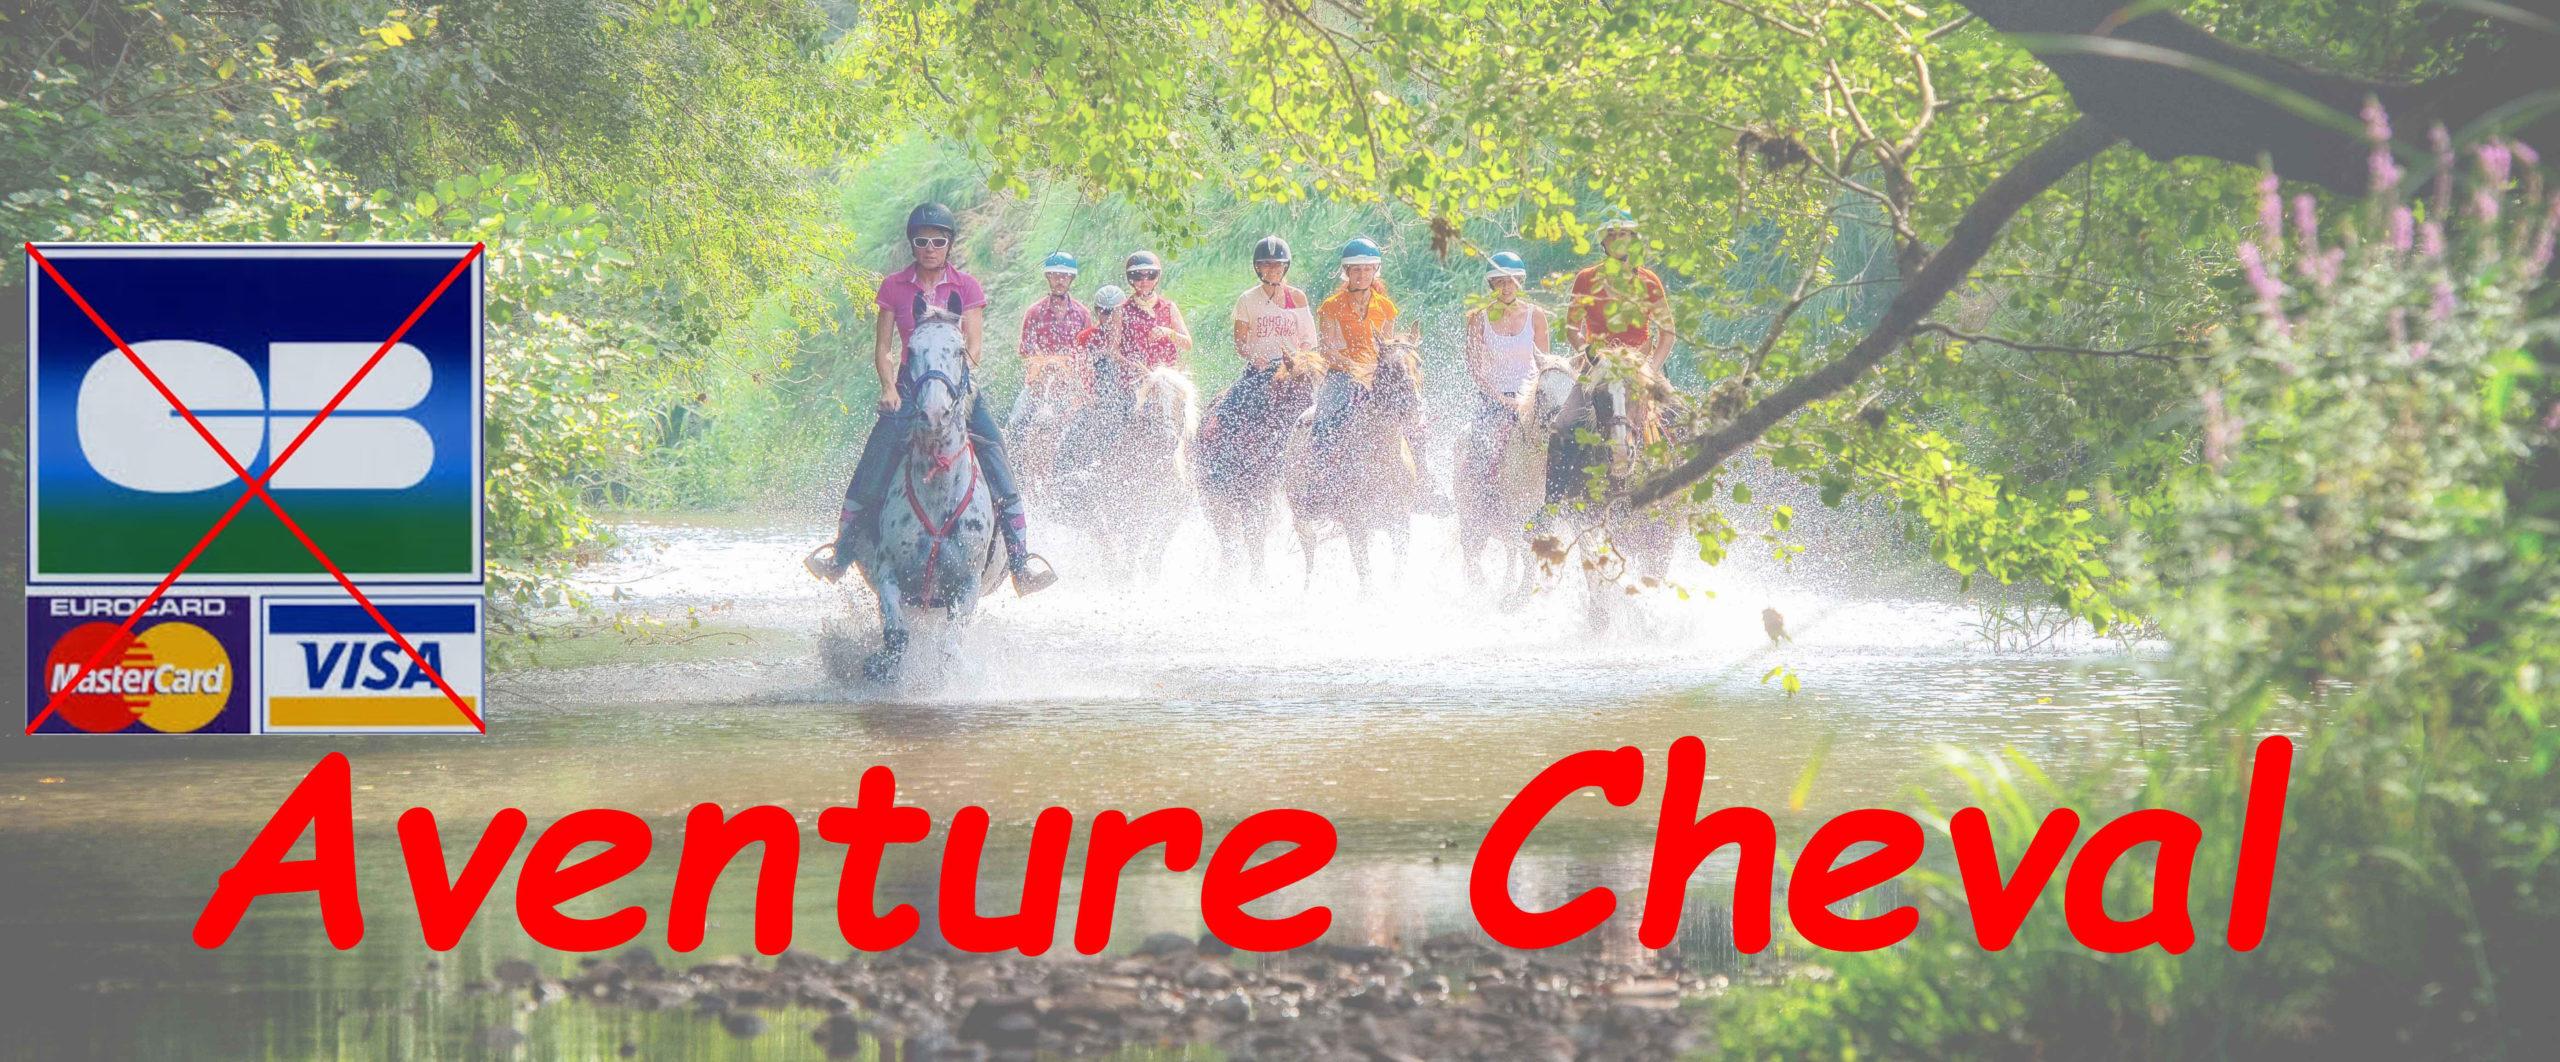 Aventure Cheval